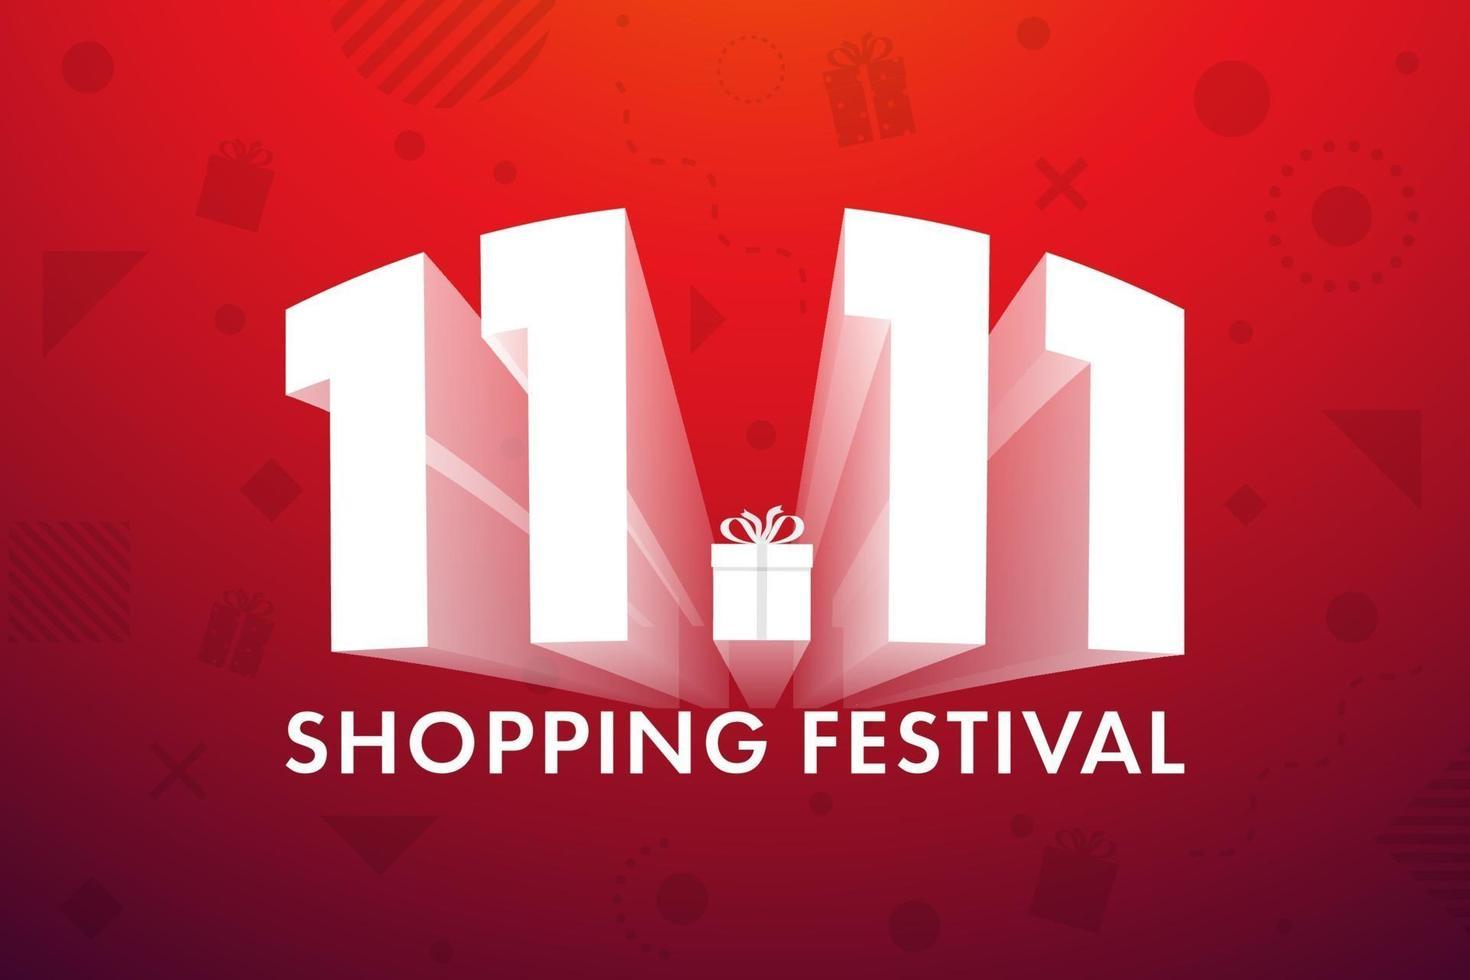 11.11 shopping festival, toespraak marketing bannerontwerp op rode achtergrond. vector illustratie